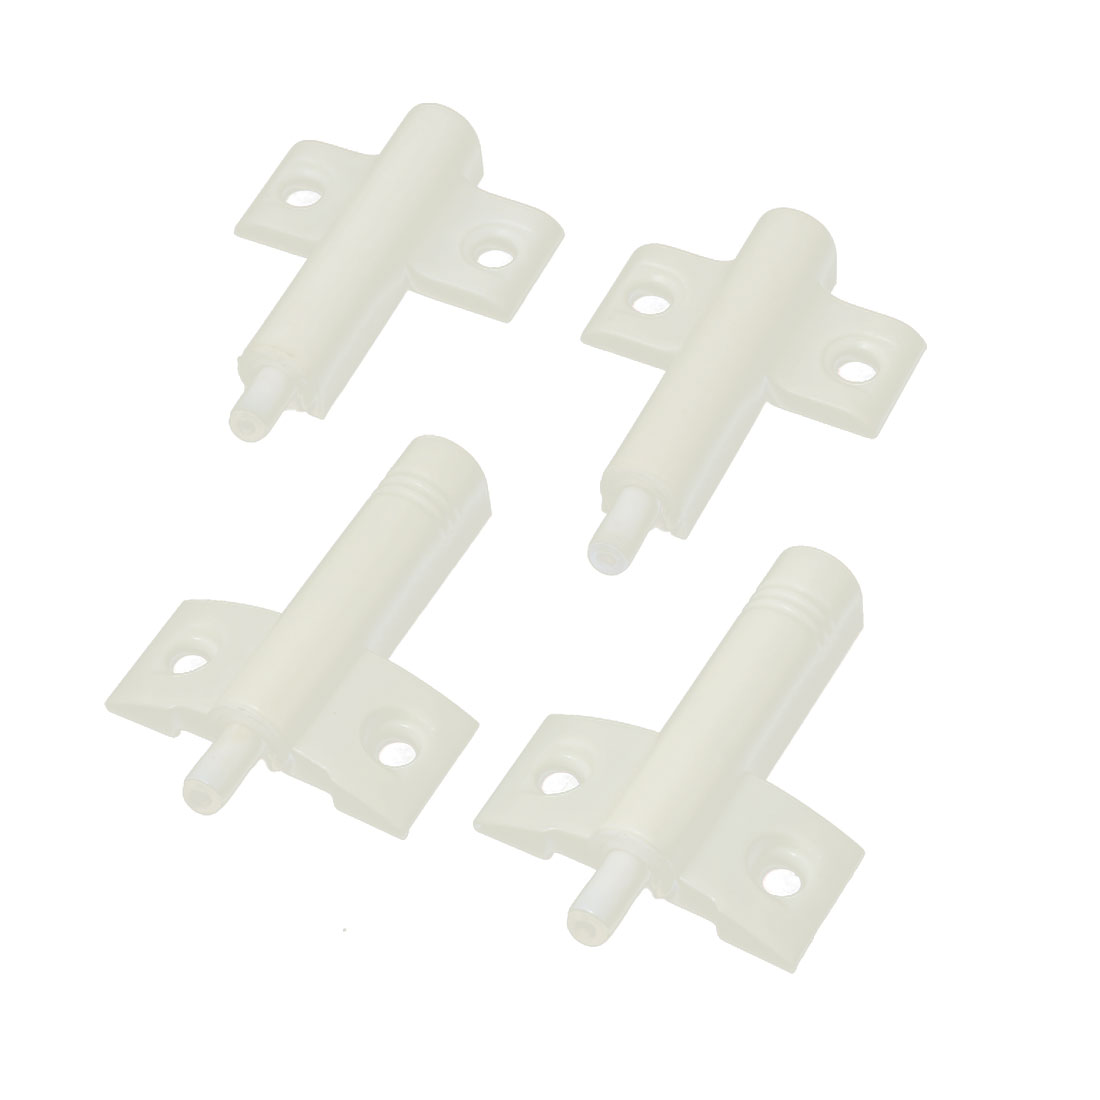 Furniture Fittings Door Damper Buffers Closer Cushion White 65mm x 45mm x 12mm 4 Pcs